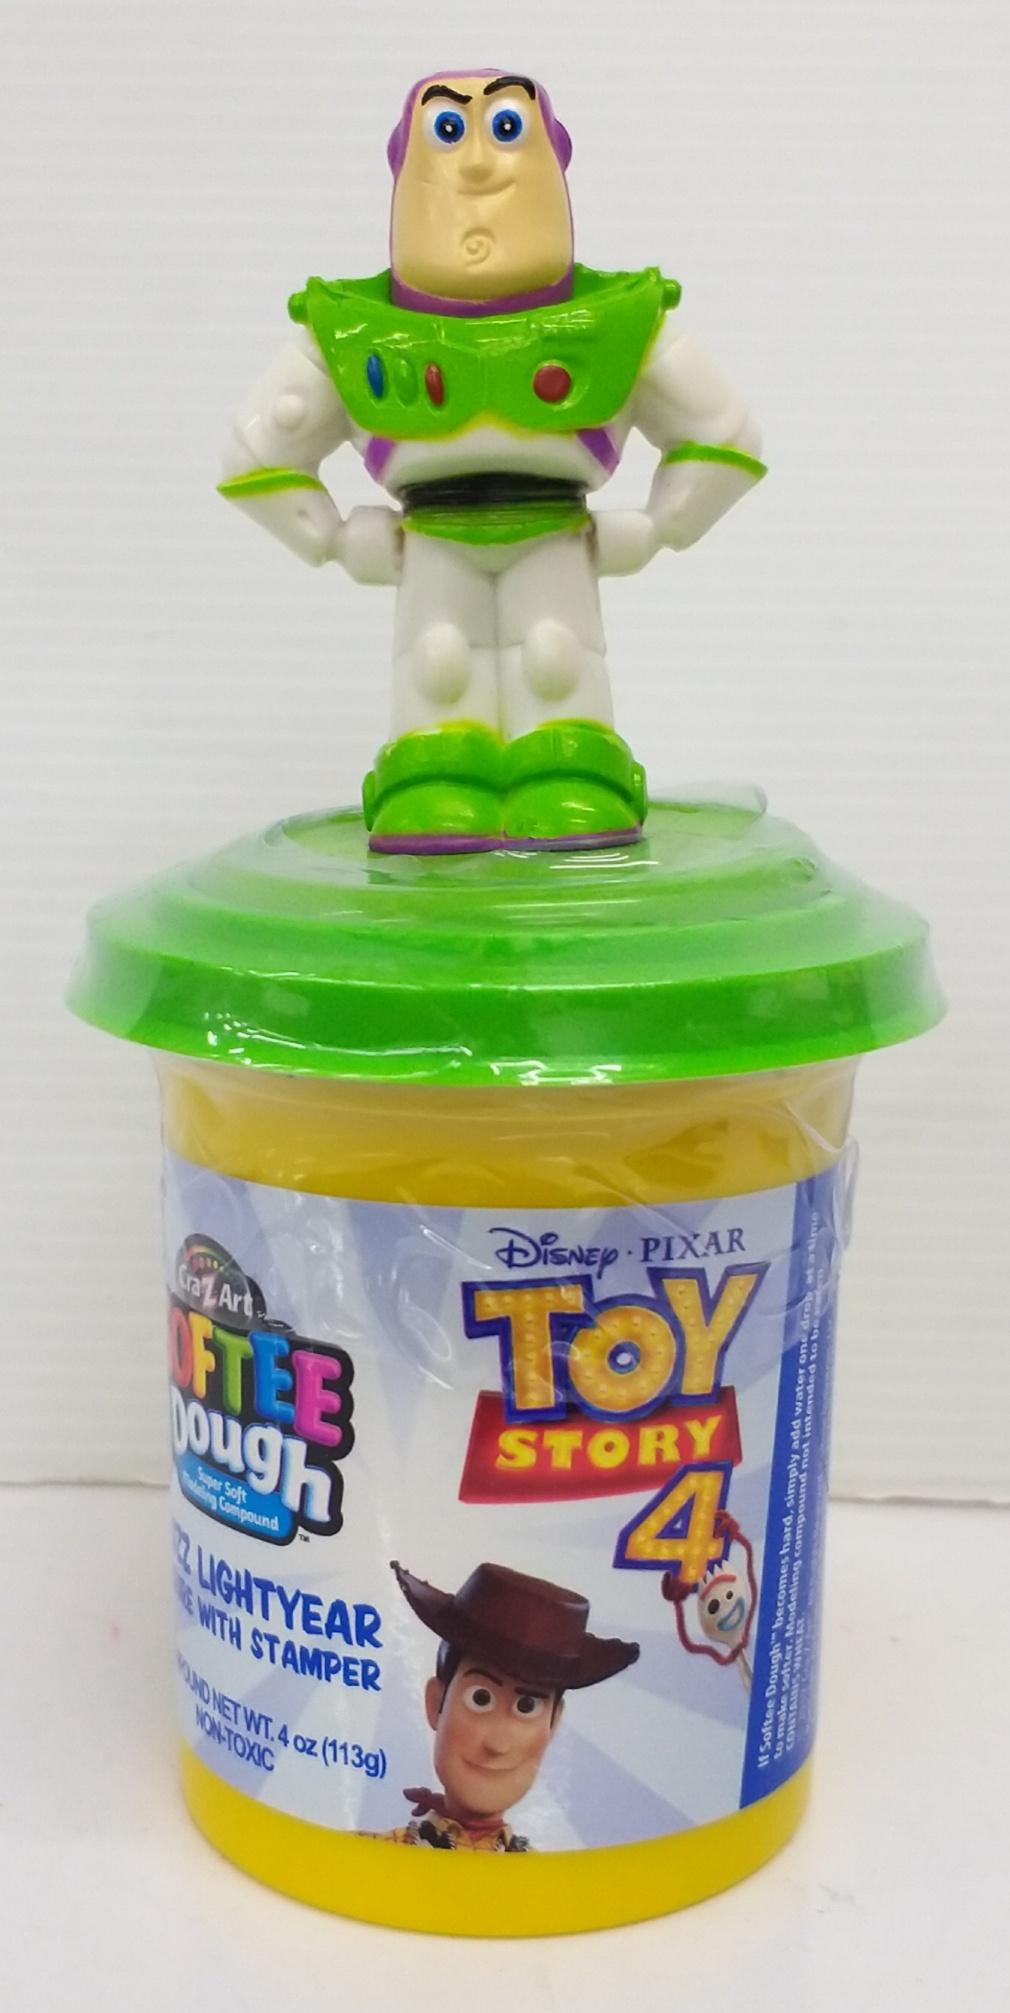 Disney Toy Story 4 Softee Dough Figure Stamper Buz